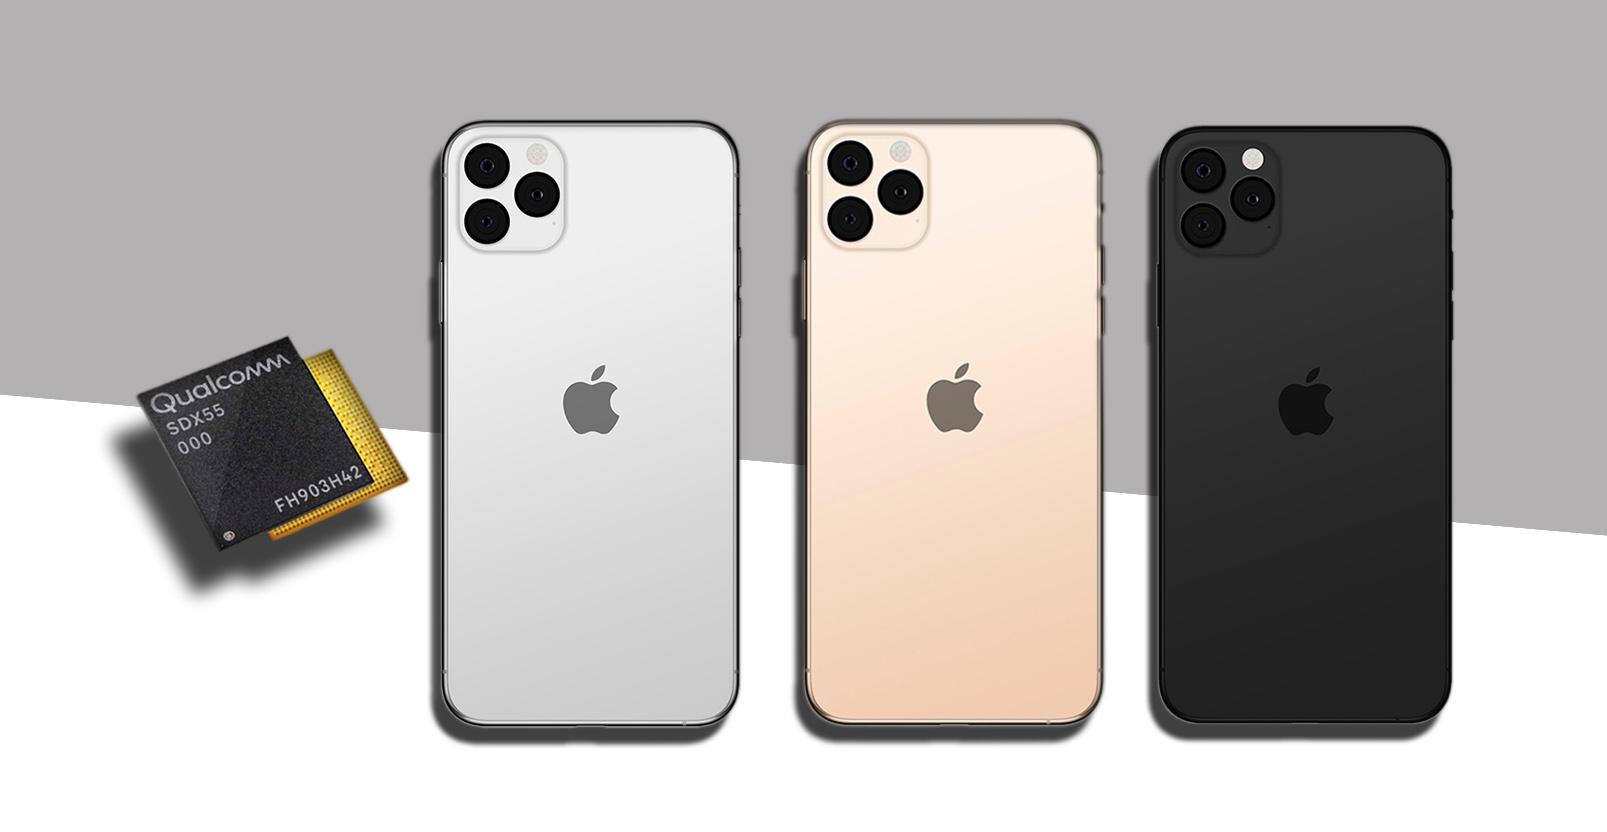 iPhone 12 Launch Will Help Apple Capture 5G Phone Market